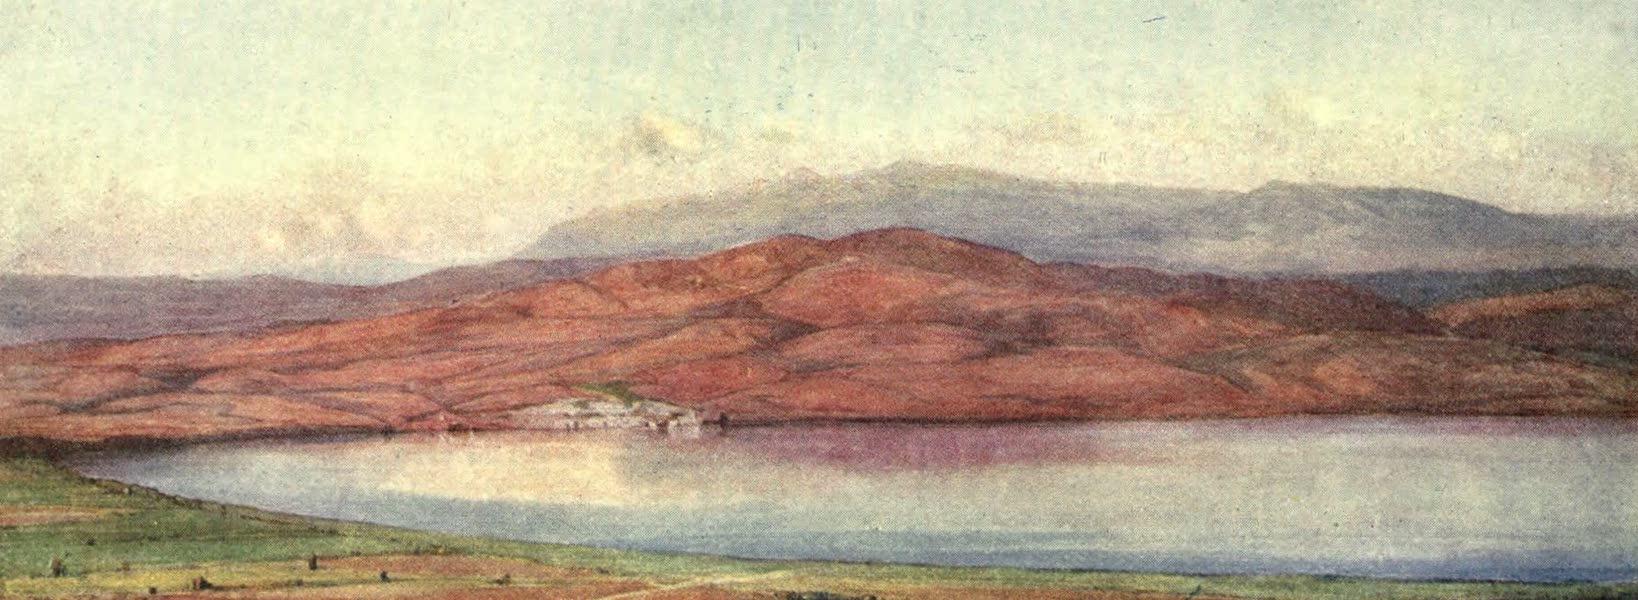 The Salonika Front - Doiran Town and Lake (1920)